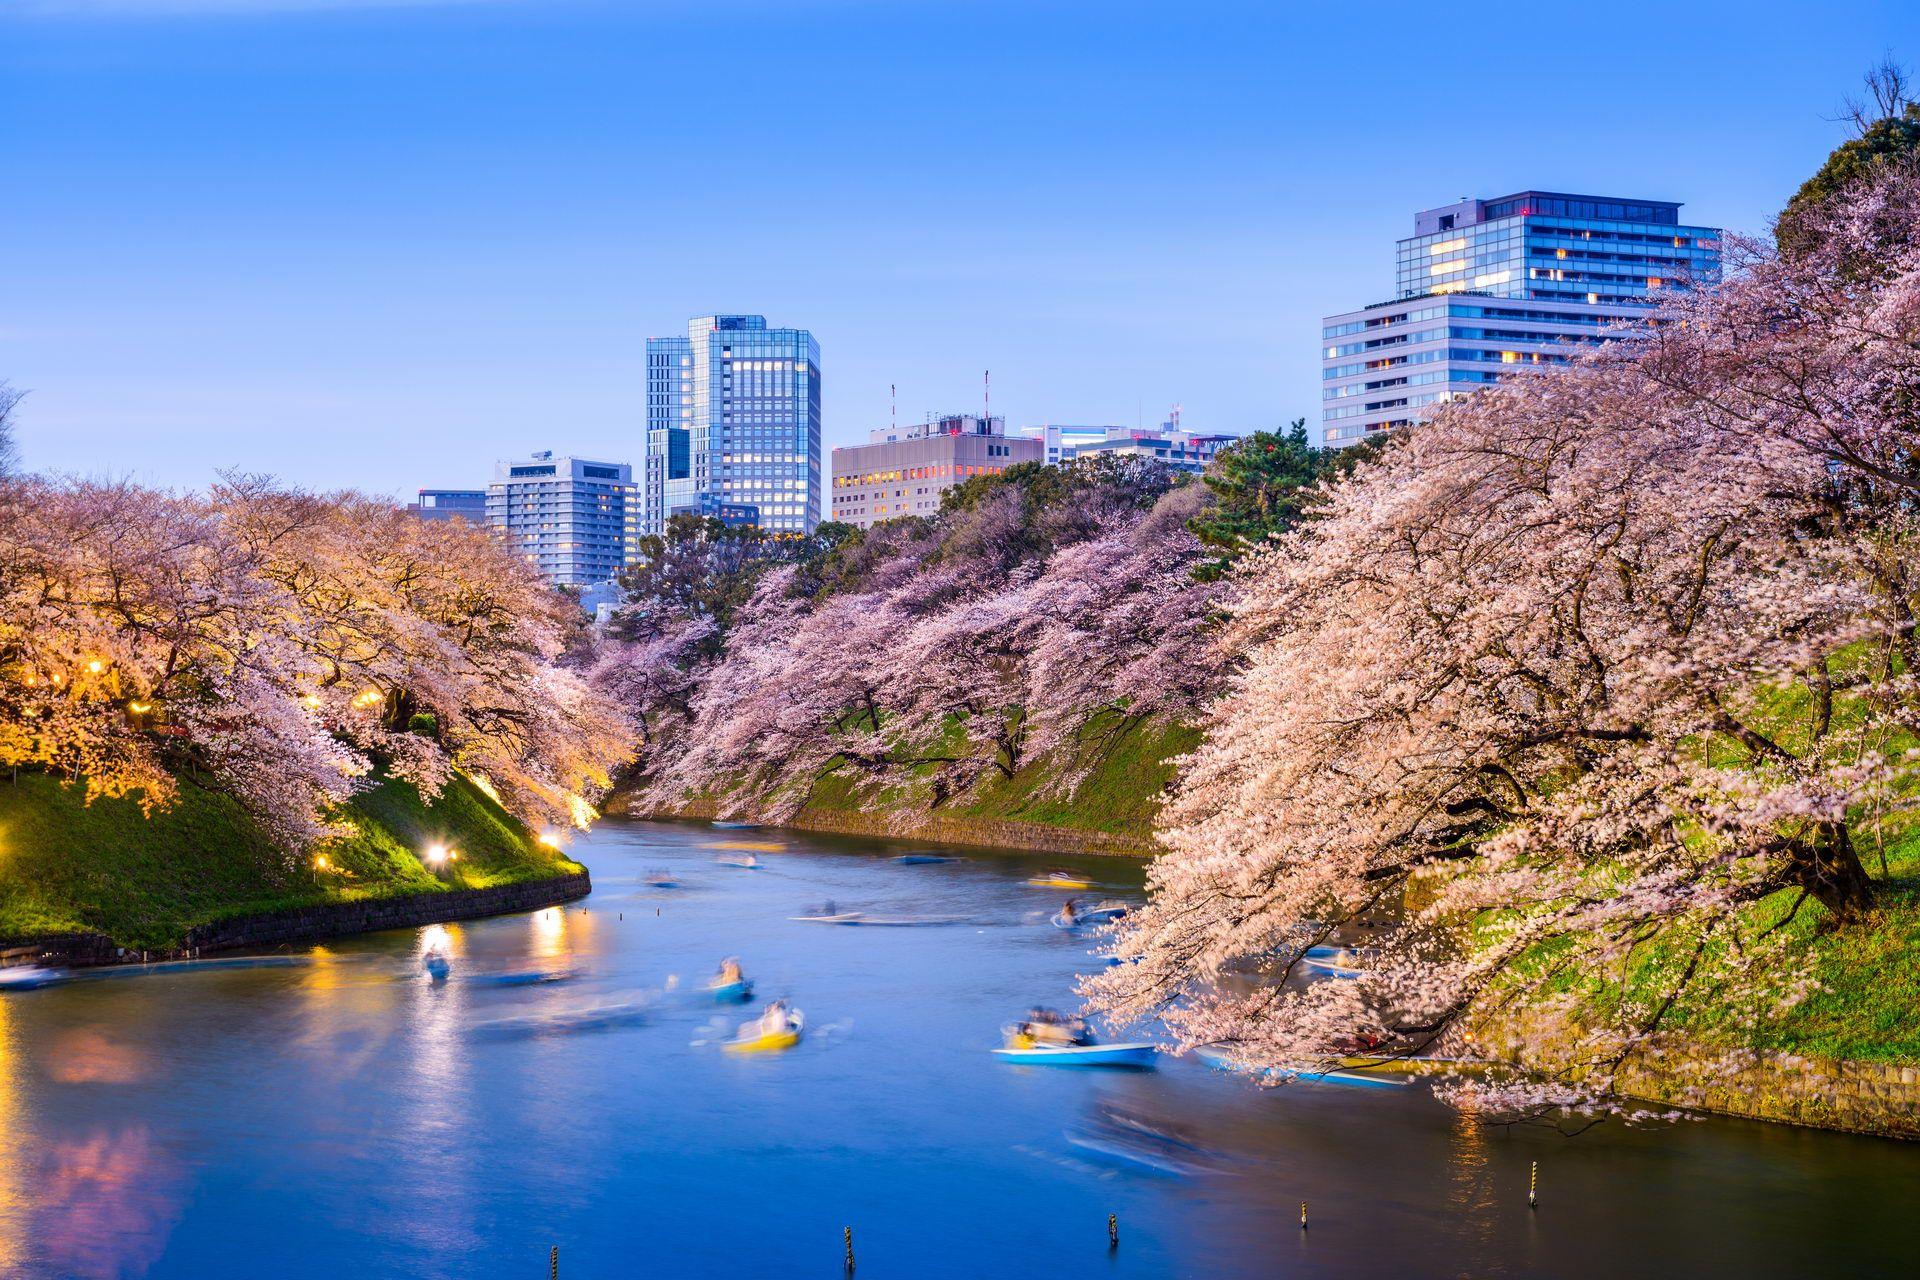 Paket Tour Jepang 4 Hari 3 Malam